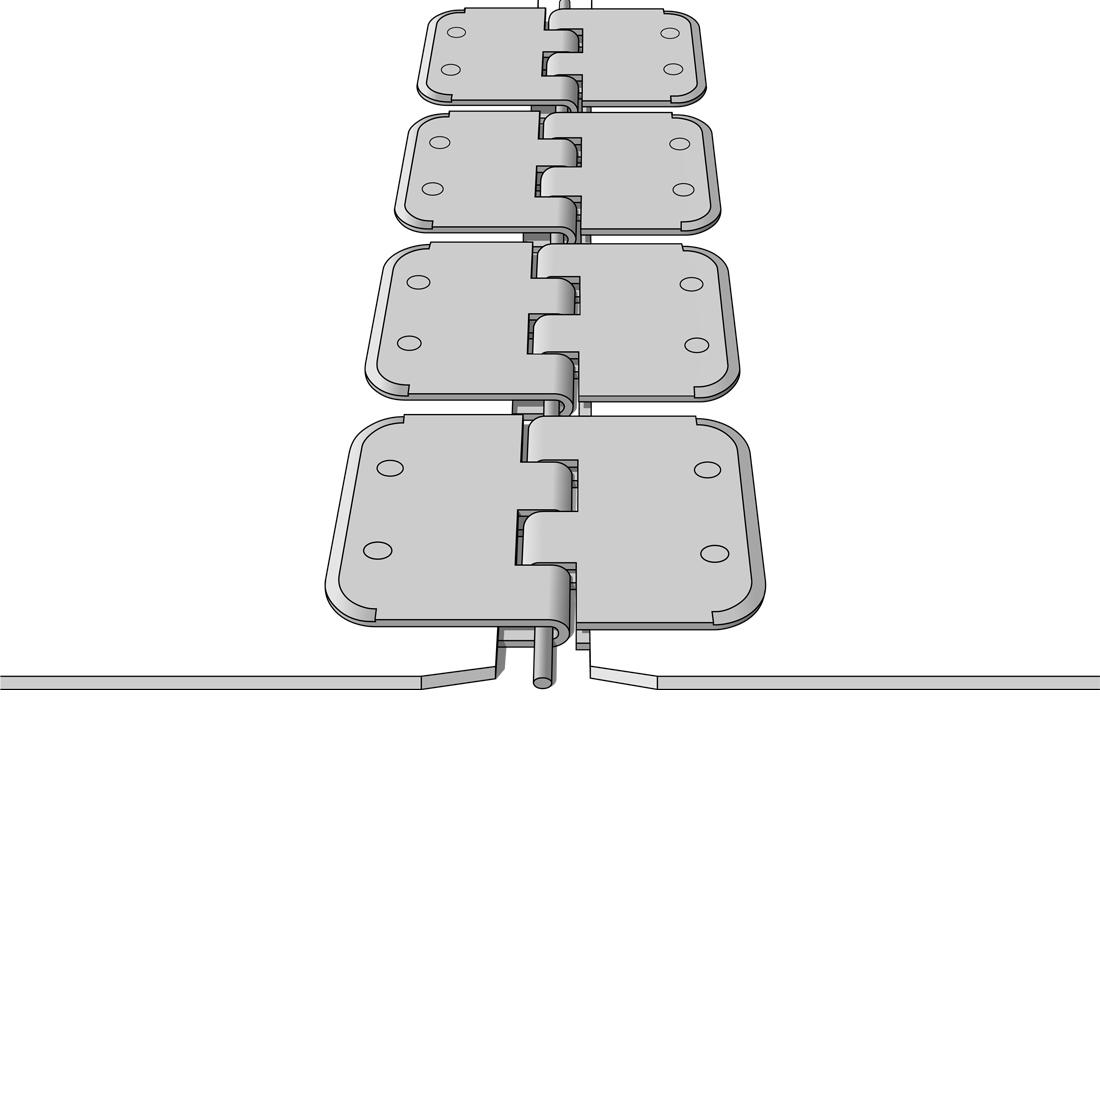 Alligatorverbinder aus Kunststoff